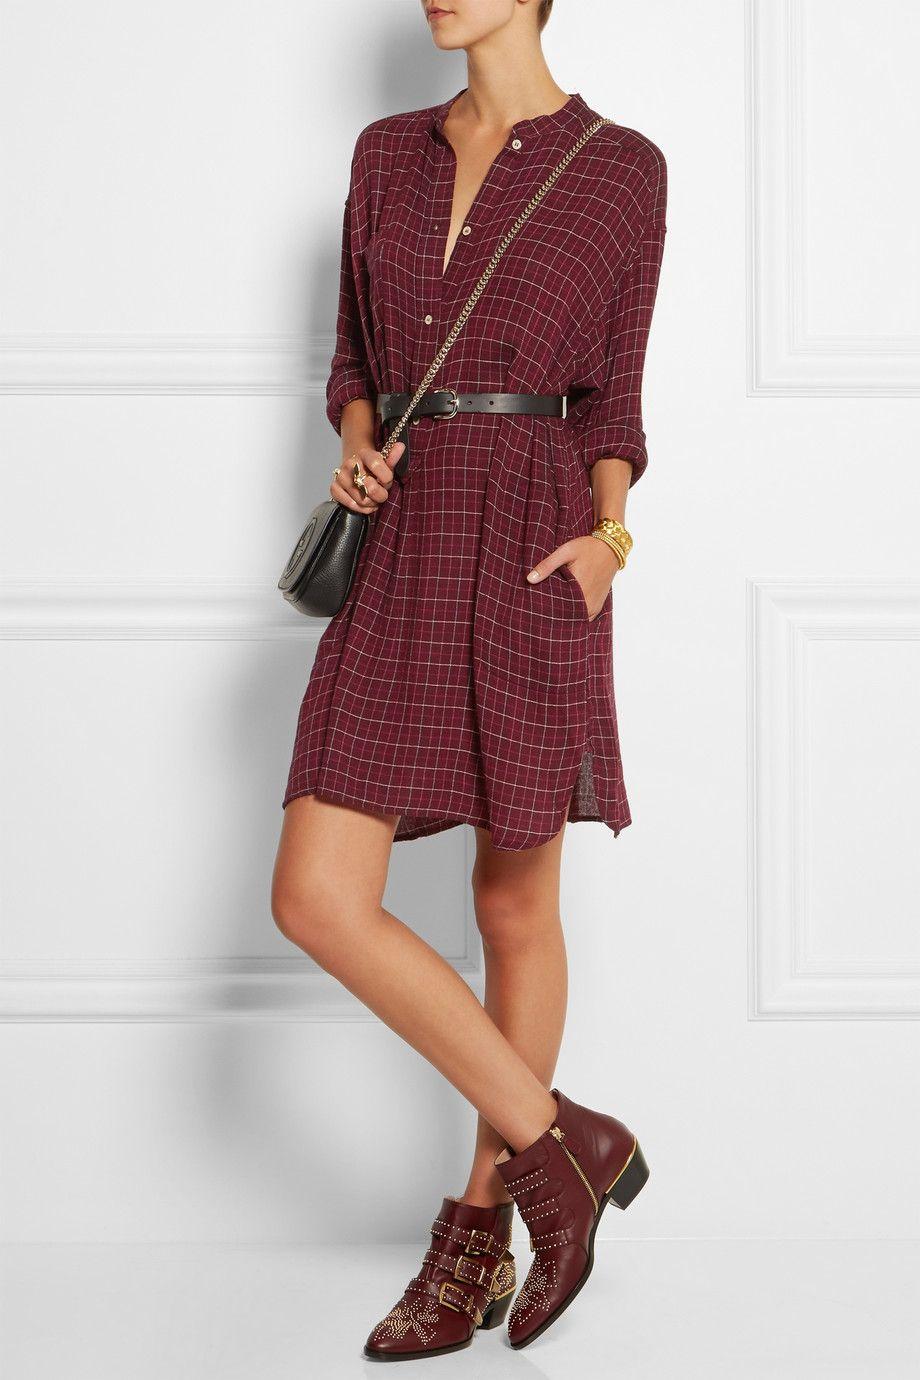 toile isabel marant mini robe chemise en flanelle carreaux peneloppe net a porter com. Black Bedroom Furniture Sets. Home Design Ideas